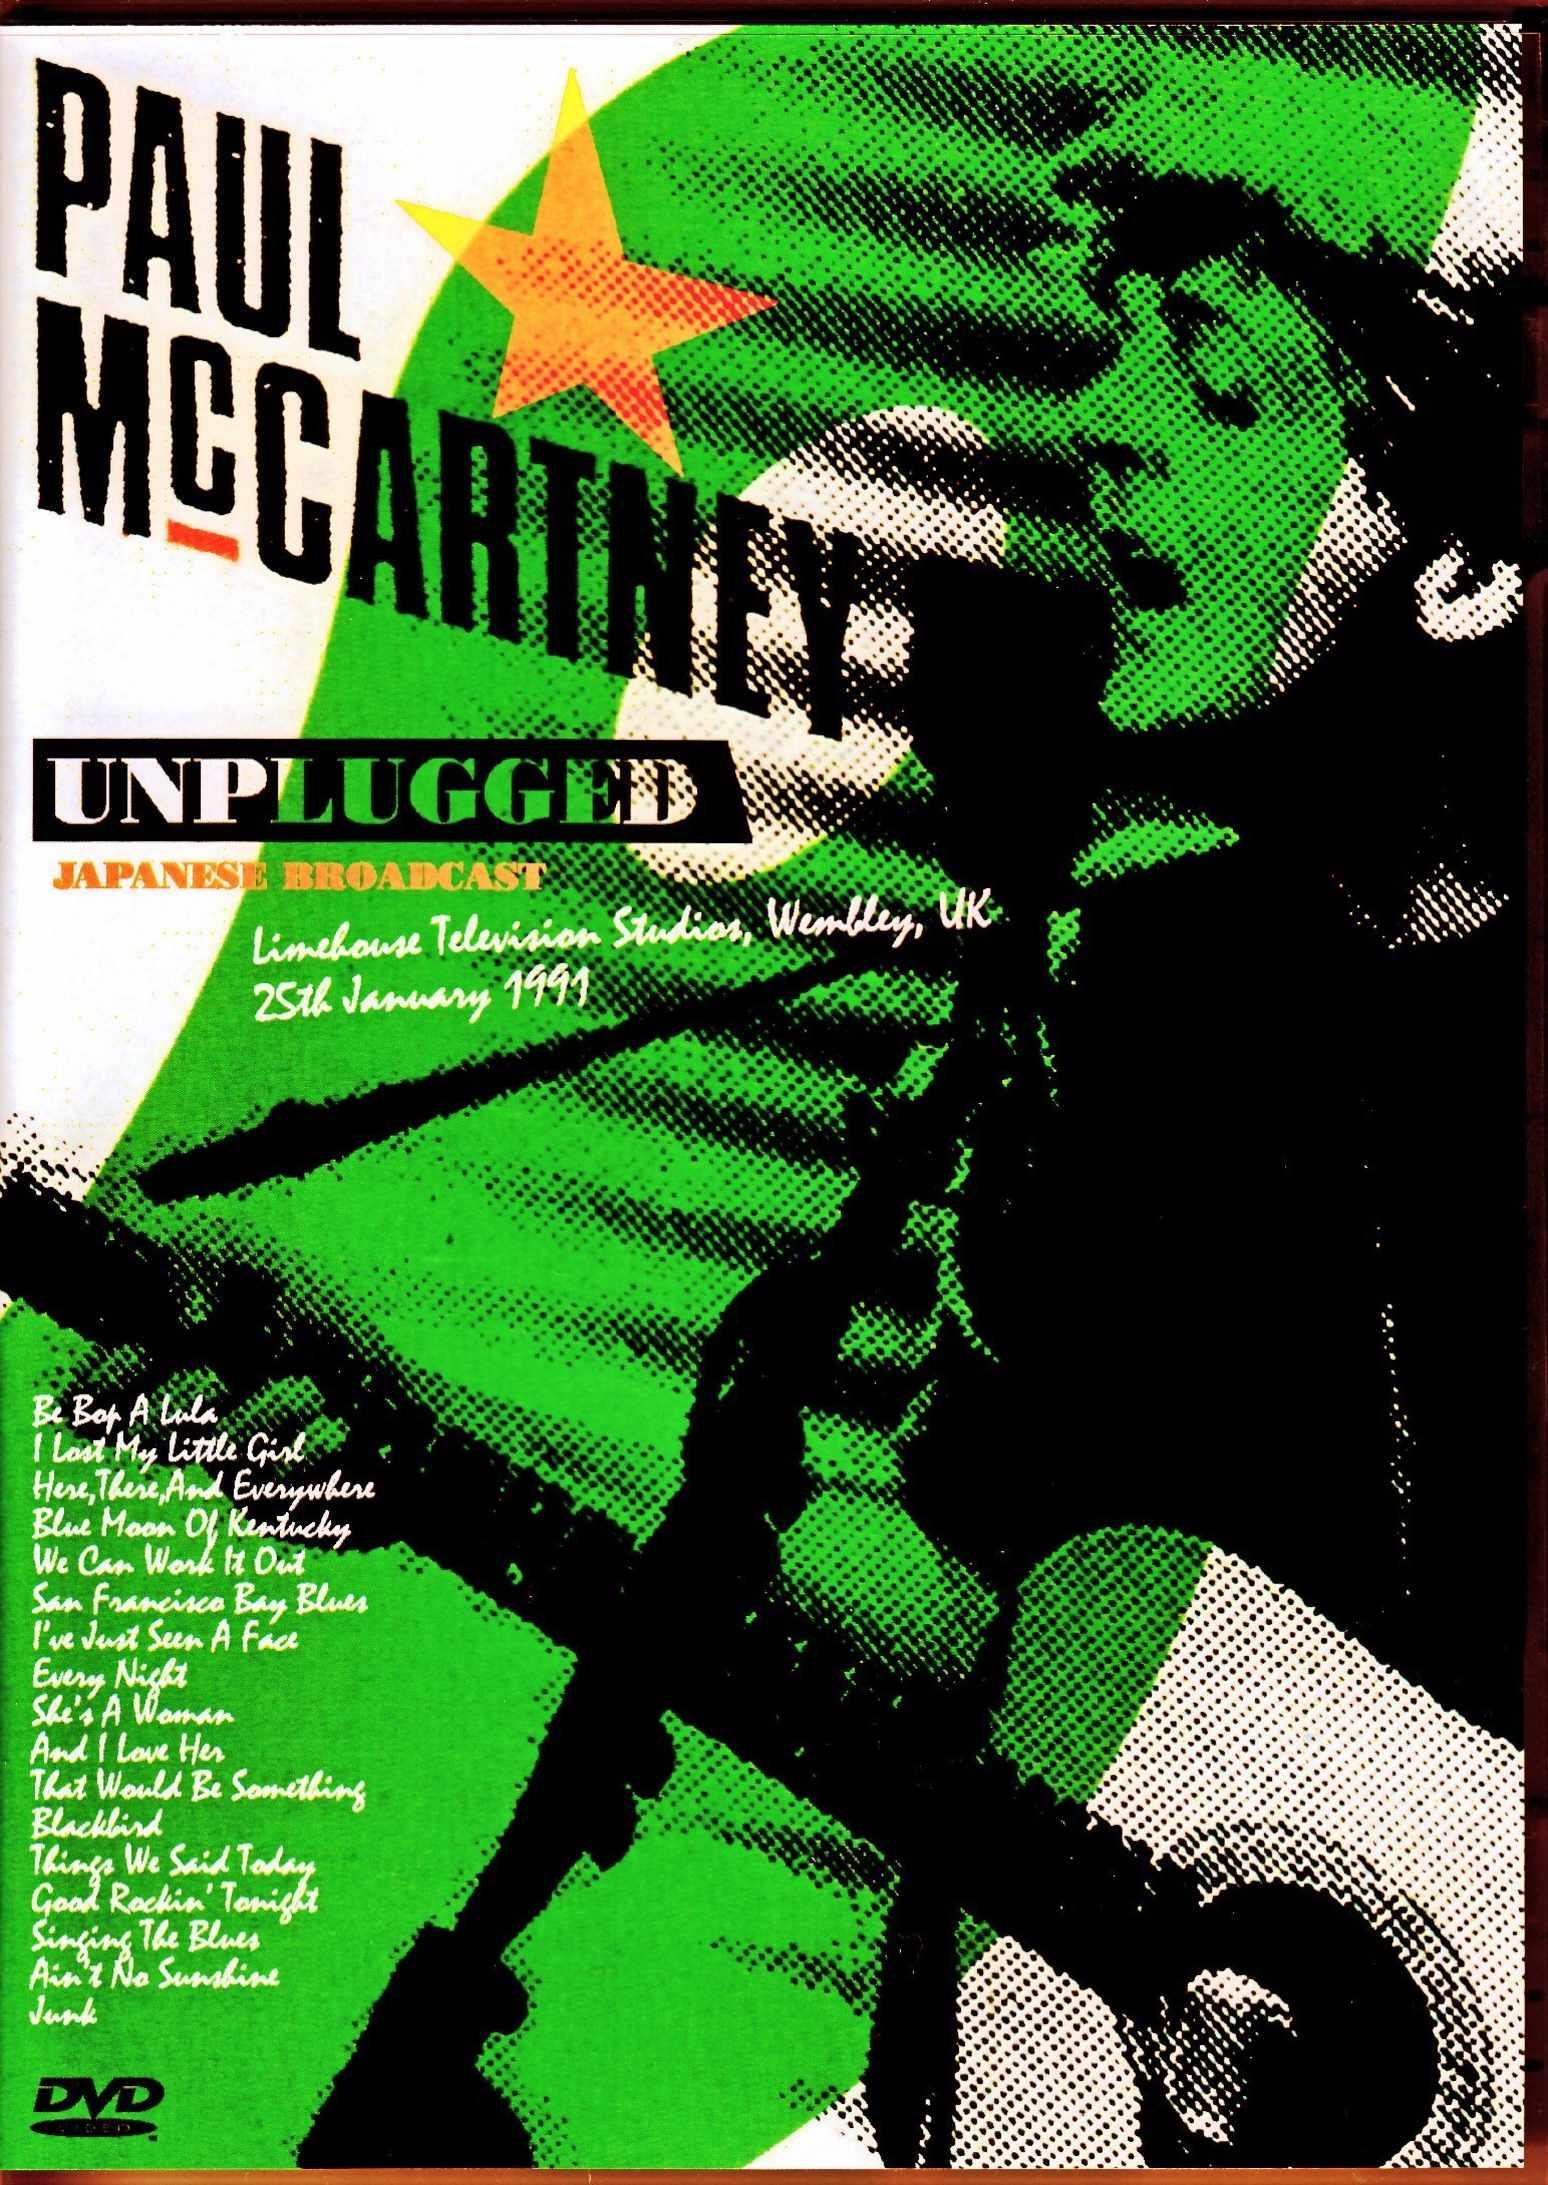 Paul McCartney ポール・マッカートニー/UK 1991 Japanese Broadcast Best Quality